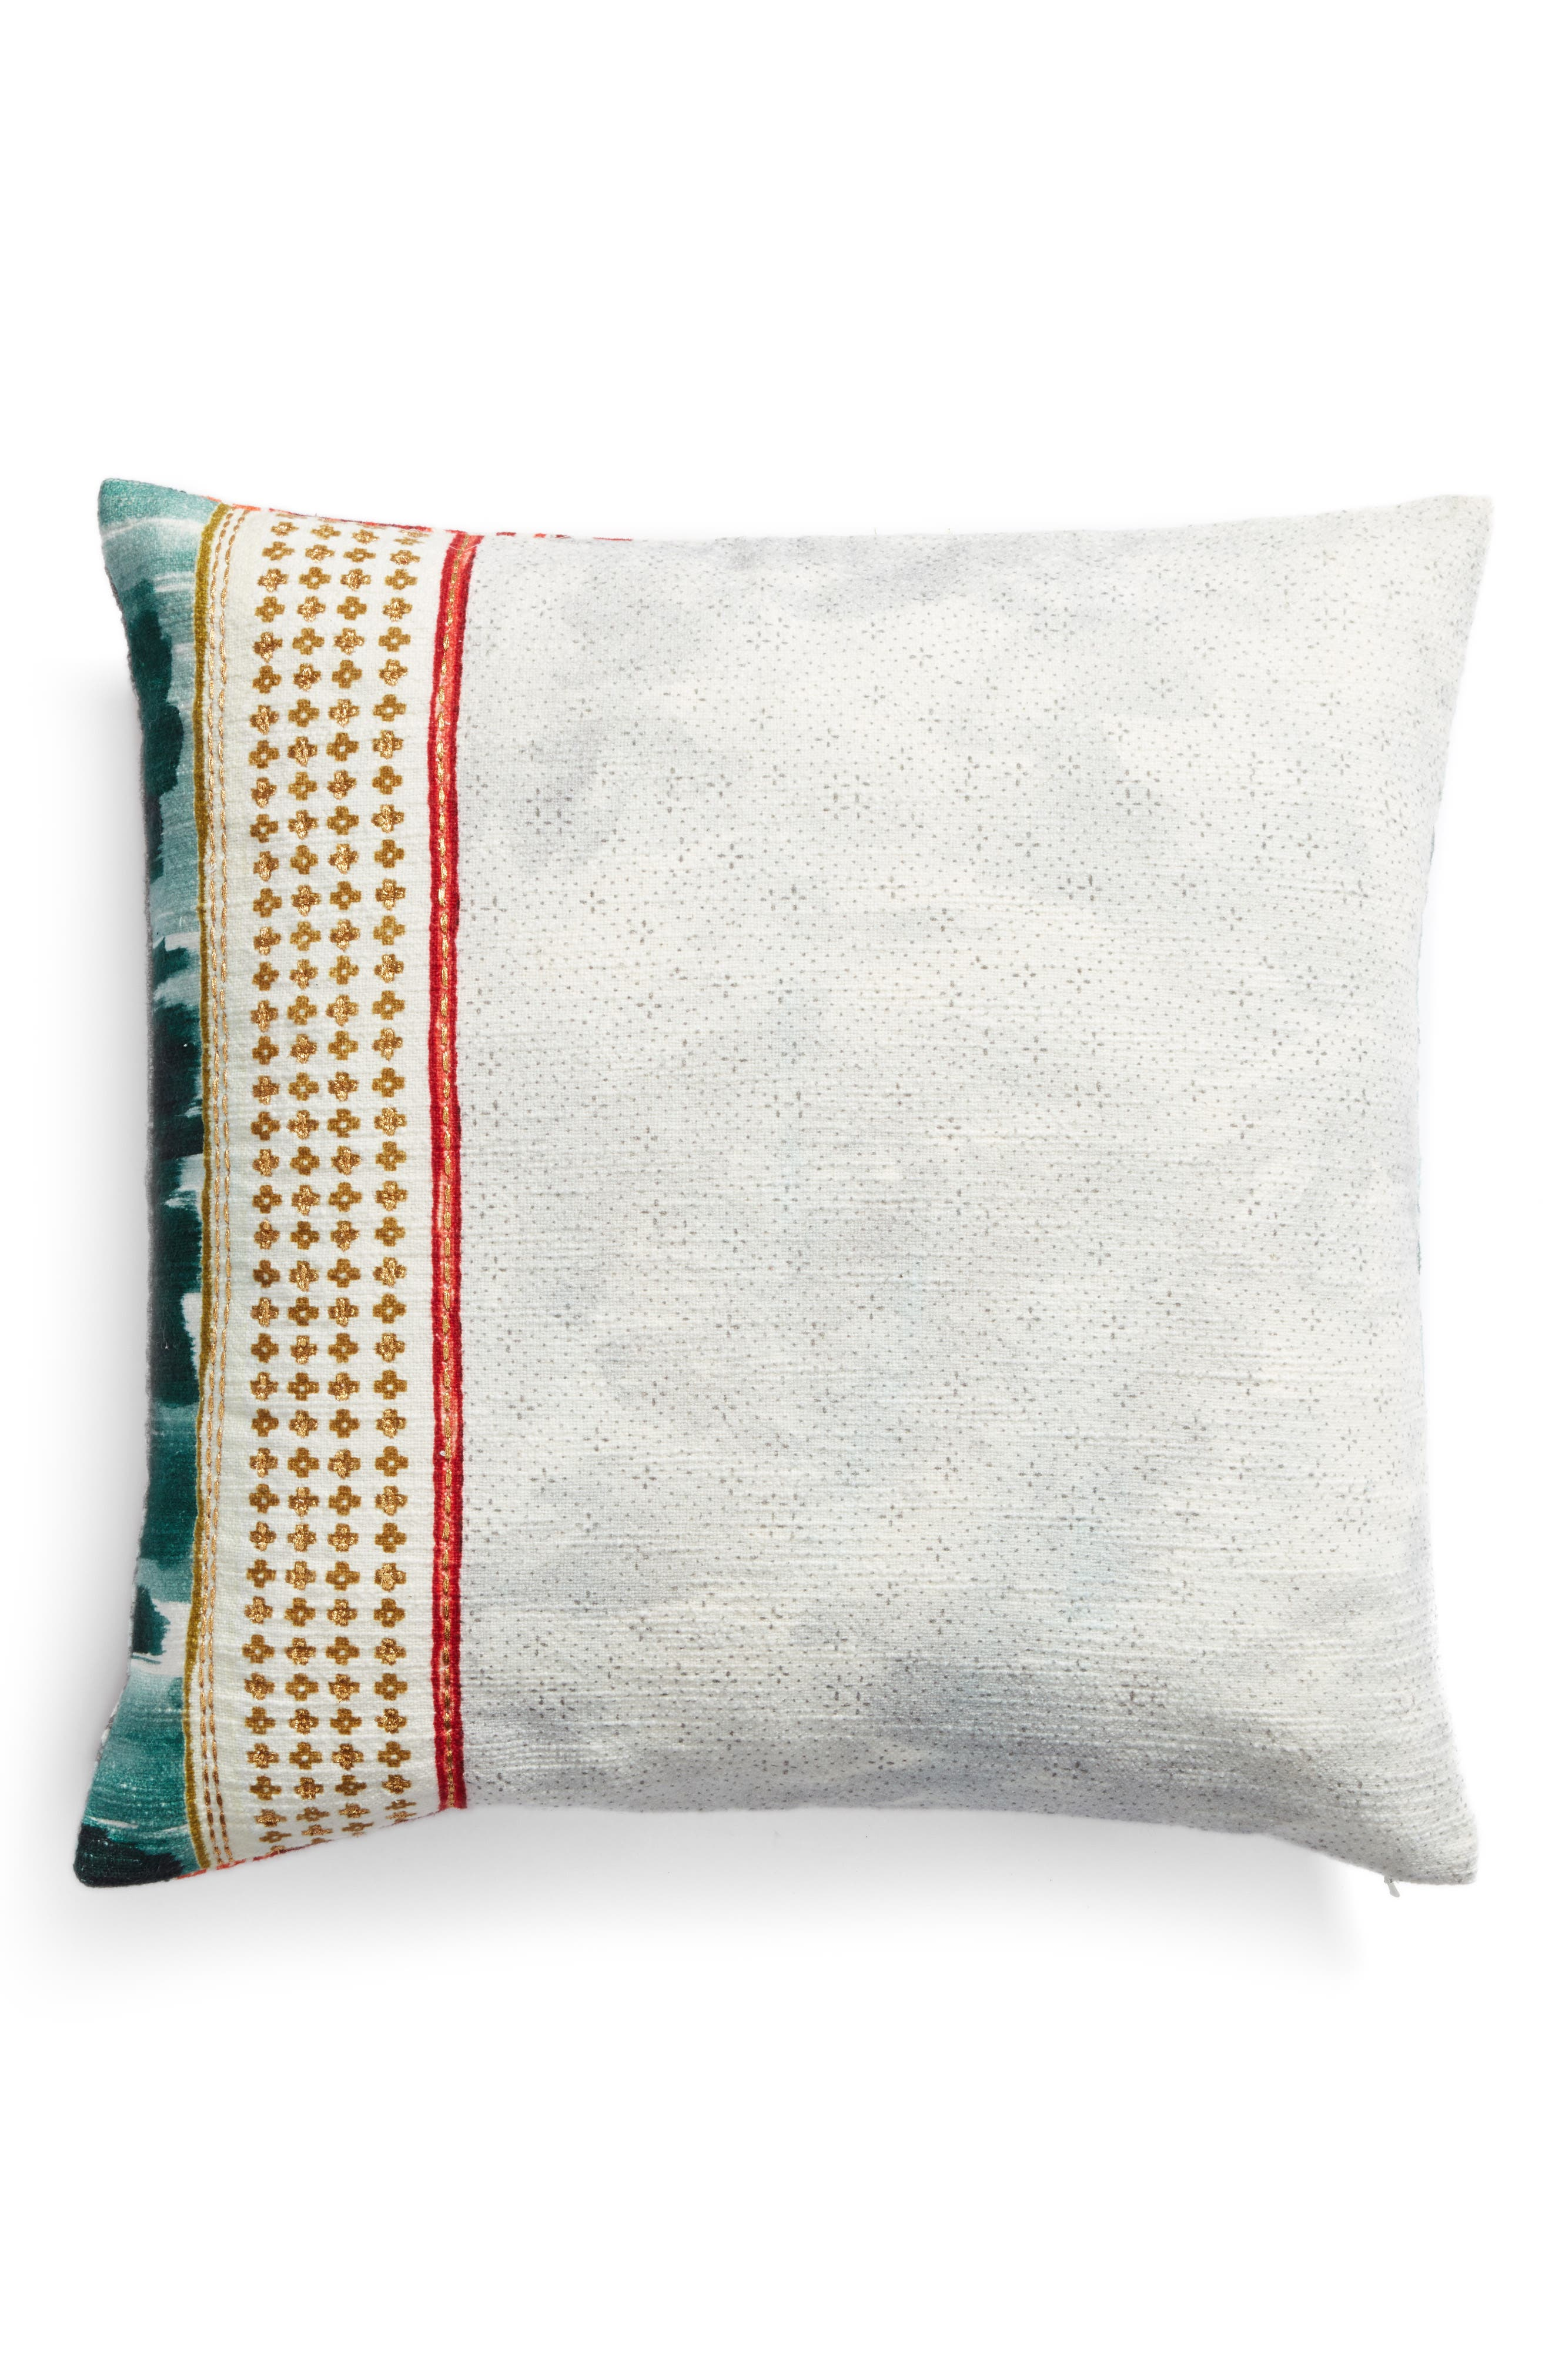 Block Print Pillow,                             Alternate thumbnail 2, color,                             900